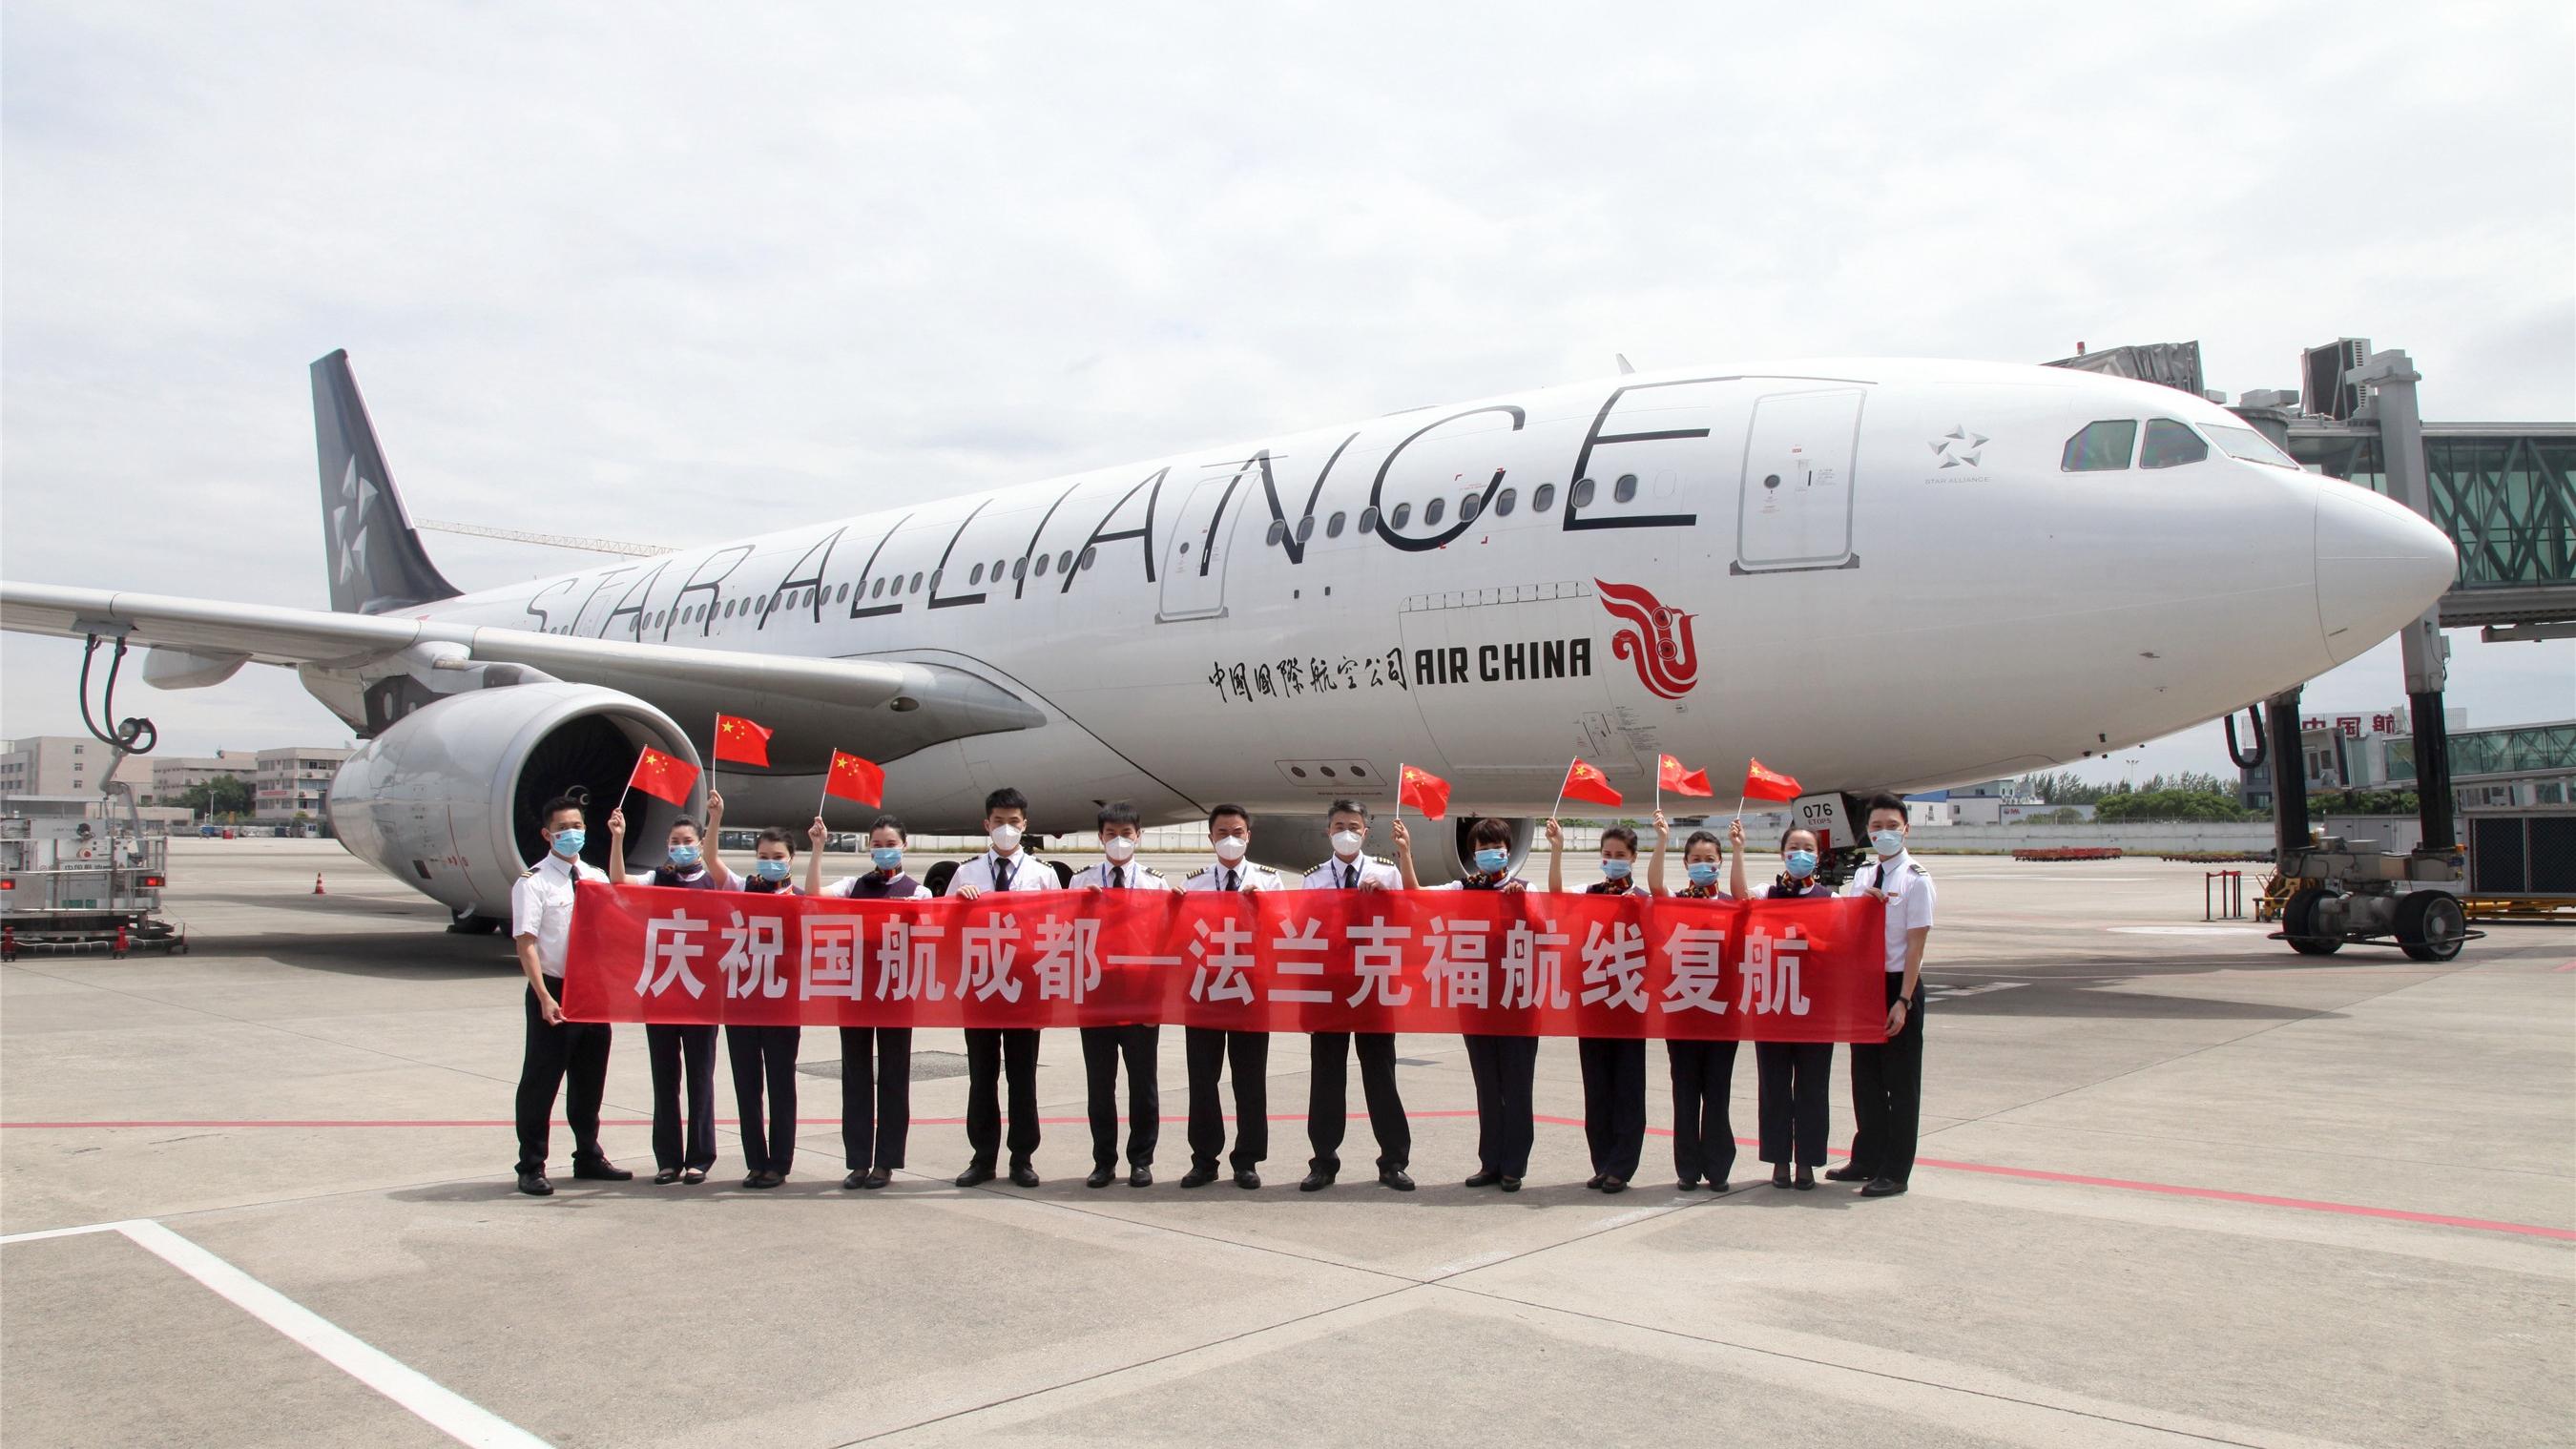 Air China's Chengdu-Frankfurt international route resumed